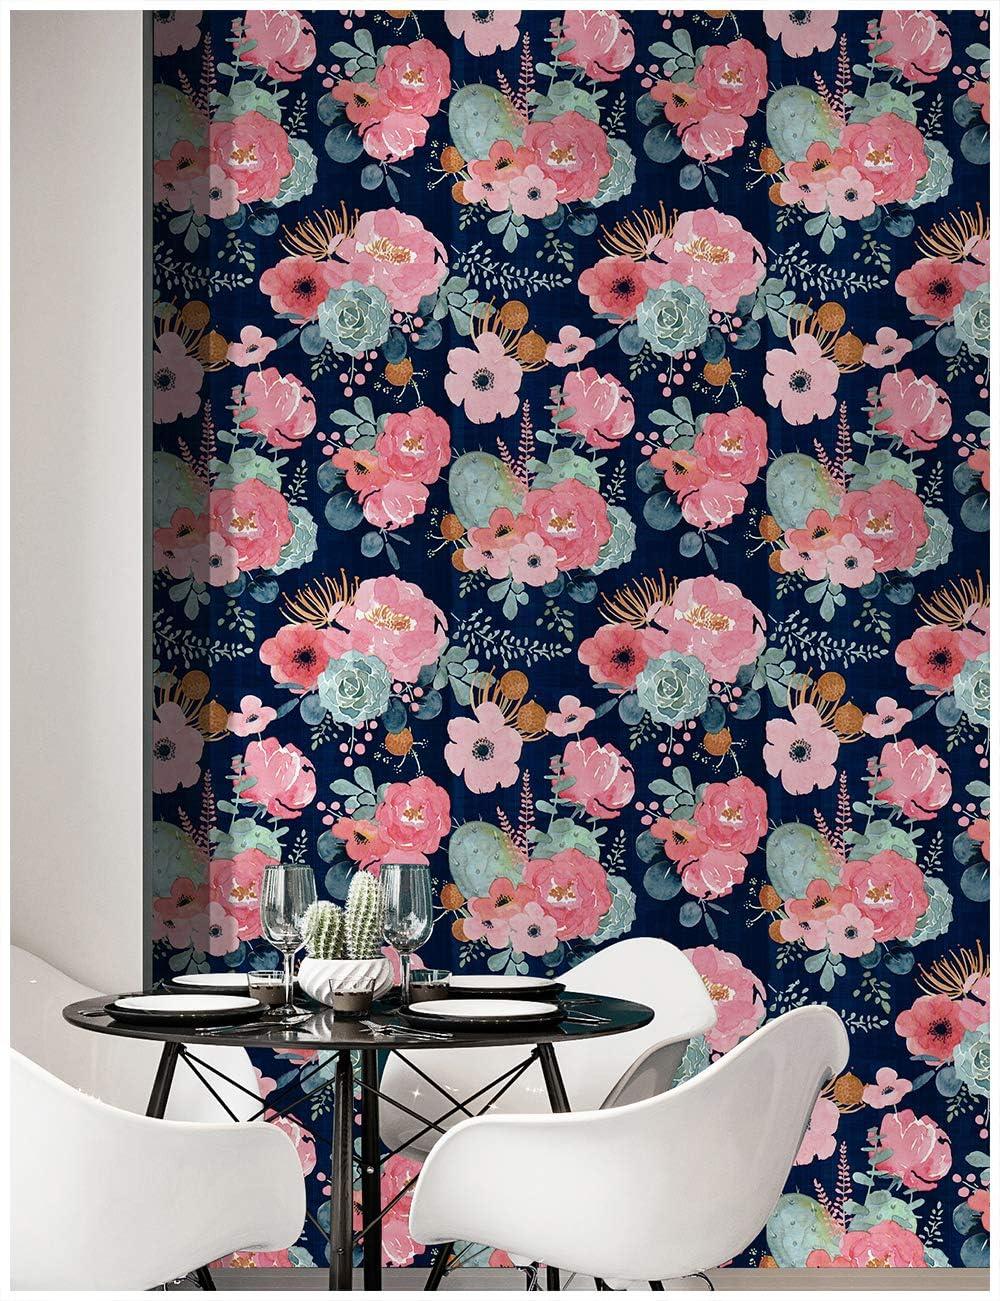 no Tejido DishyKooker Papel Pintado de Color s/ólido con Rayas Verticales Azul 10 m para decoraci/ón de Fondo de TV